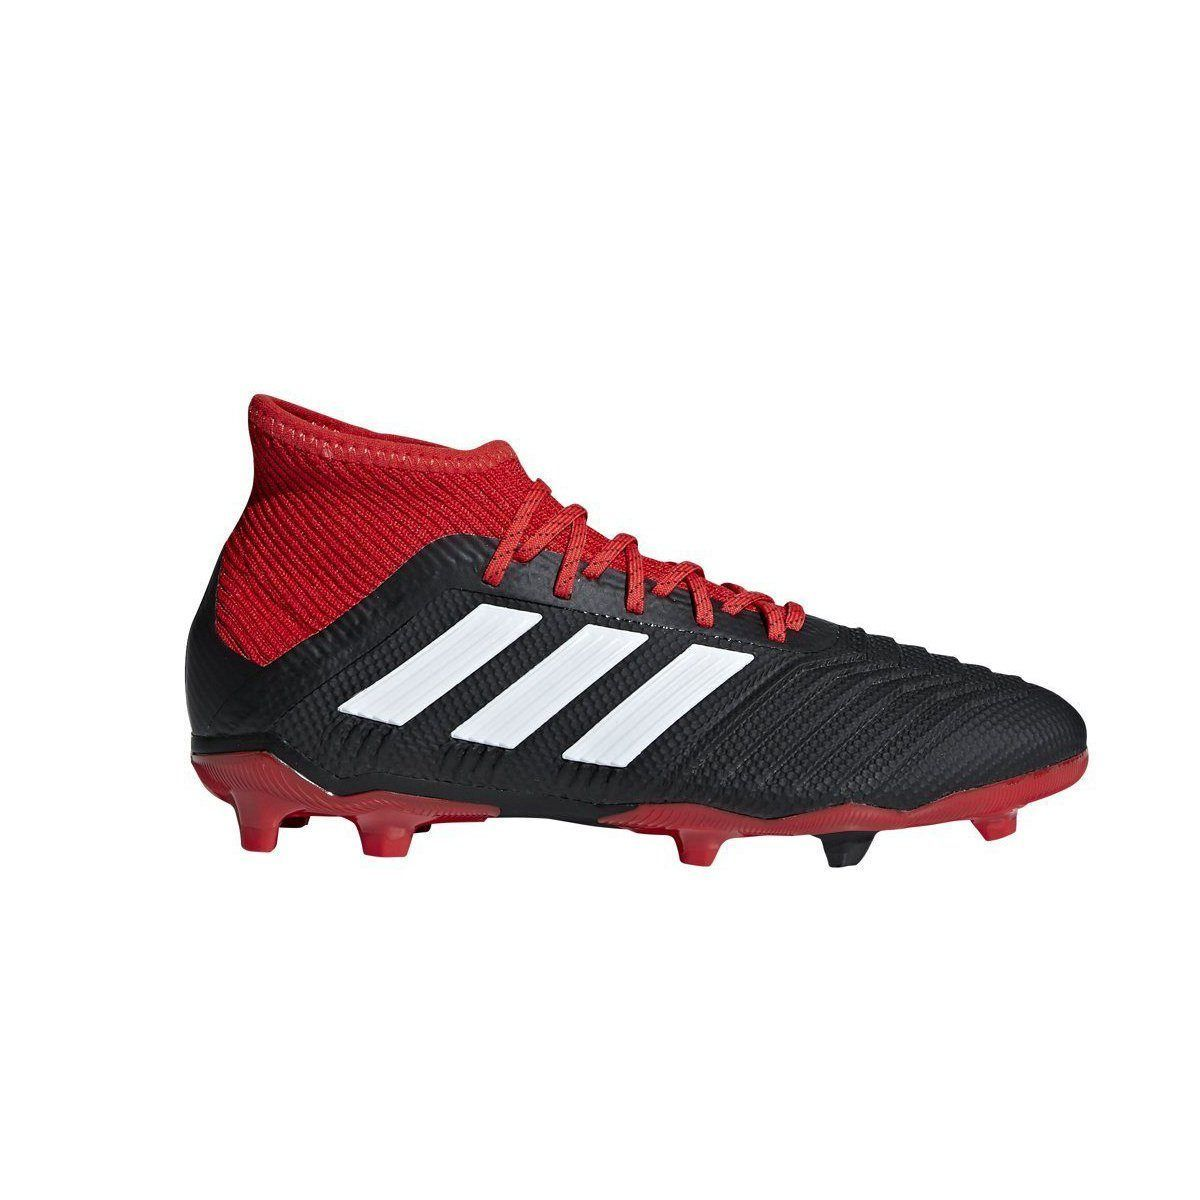 Adidas Kid S Predator 18 1 Fg Soccer Cleat Db2313 Soccer Cleats Adidas Sneakers Men Fashion Soccer Cleats